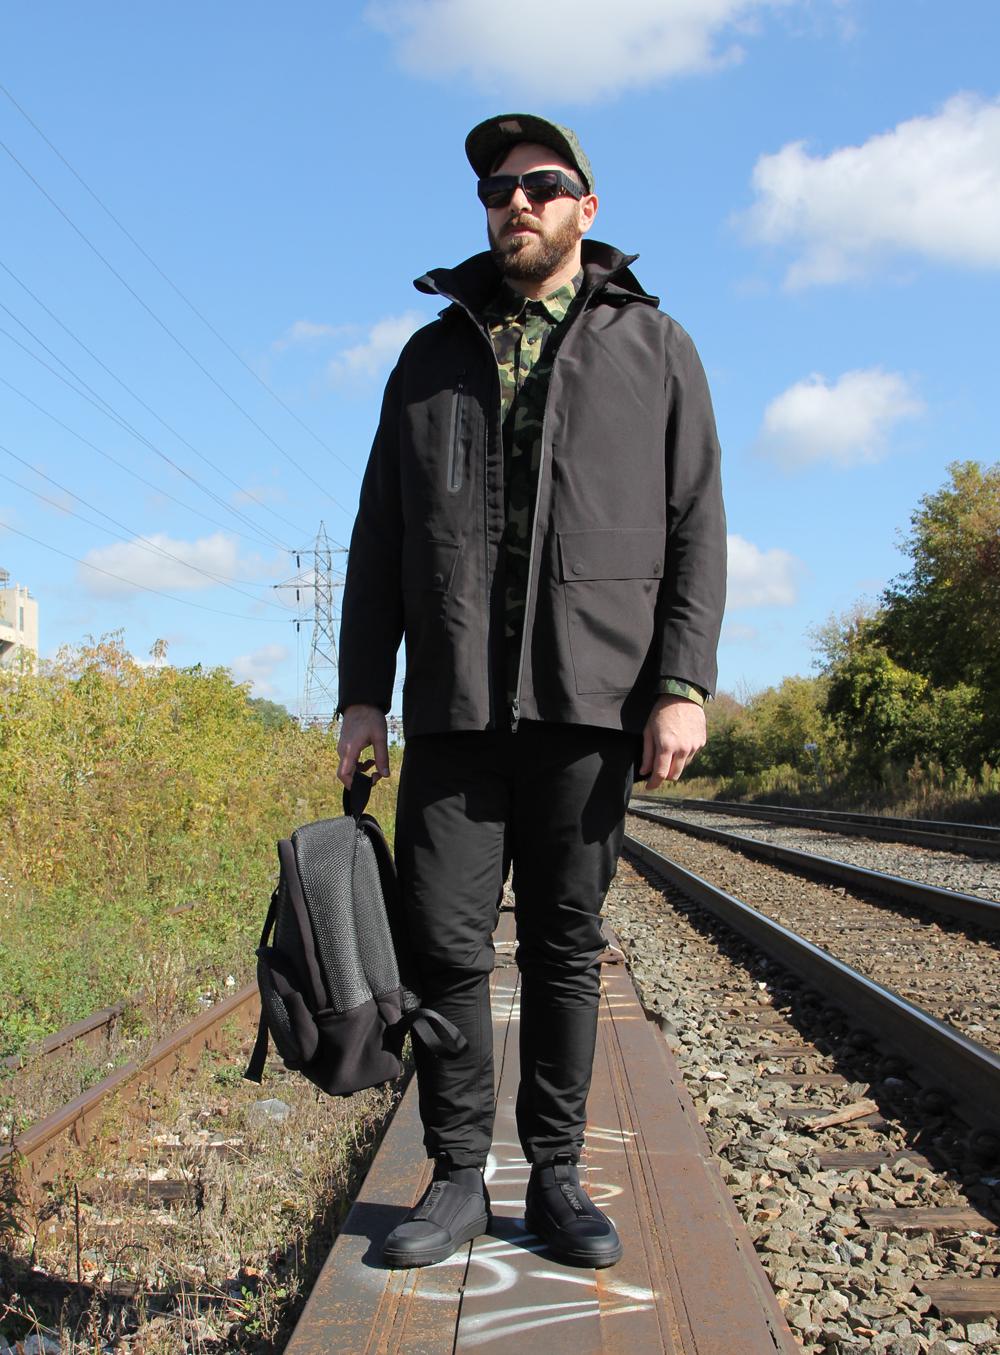 Alexander Wang x HM - Sidewalk Hustle Lookbook - Standing